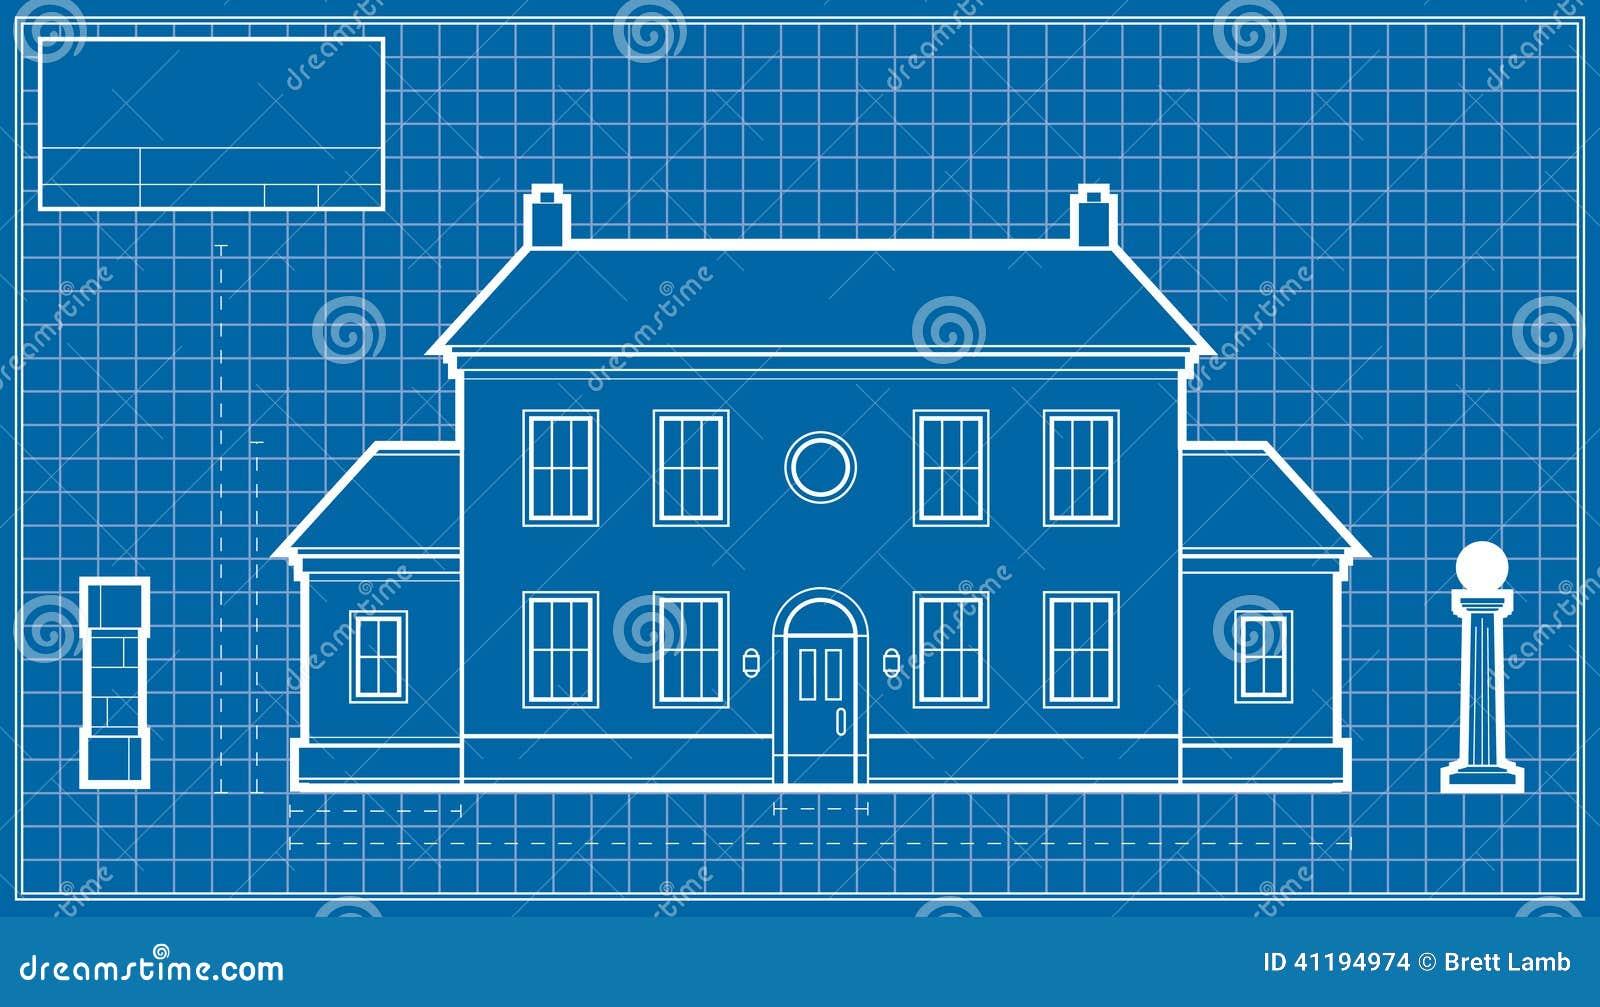 Mansion blueprint stock illustration illustration of paper 41194974 download comp malvernweather Choice Image